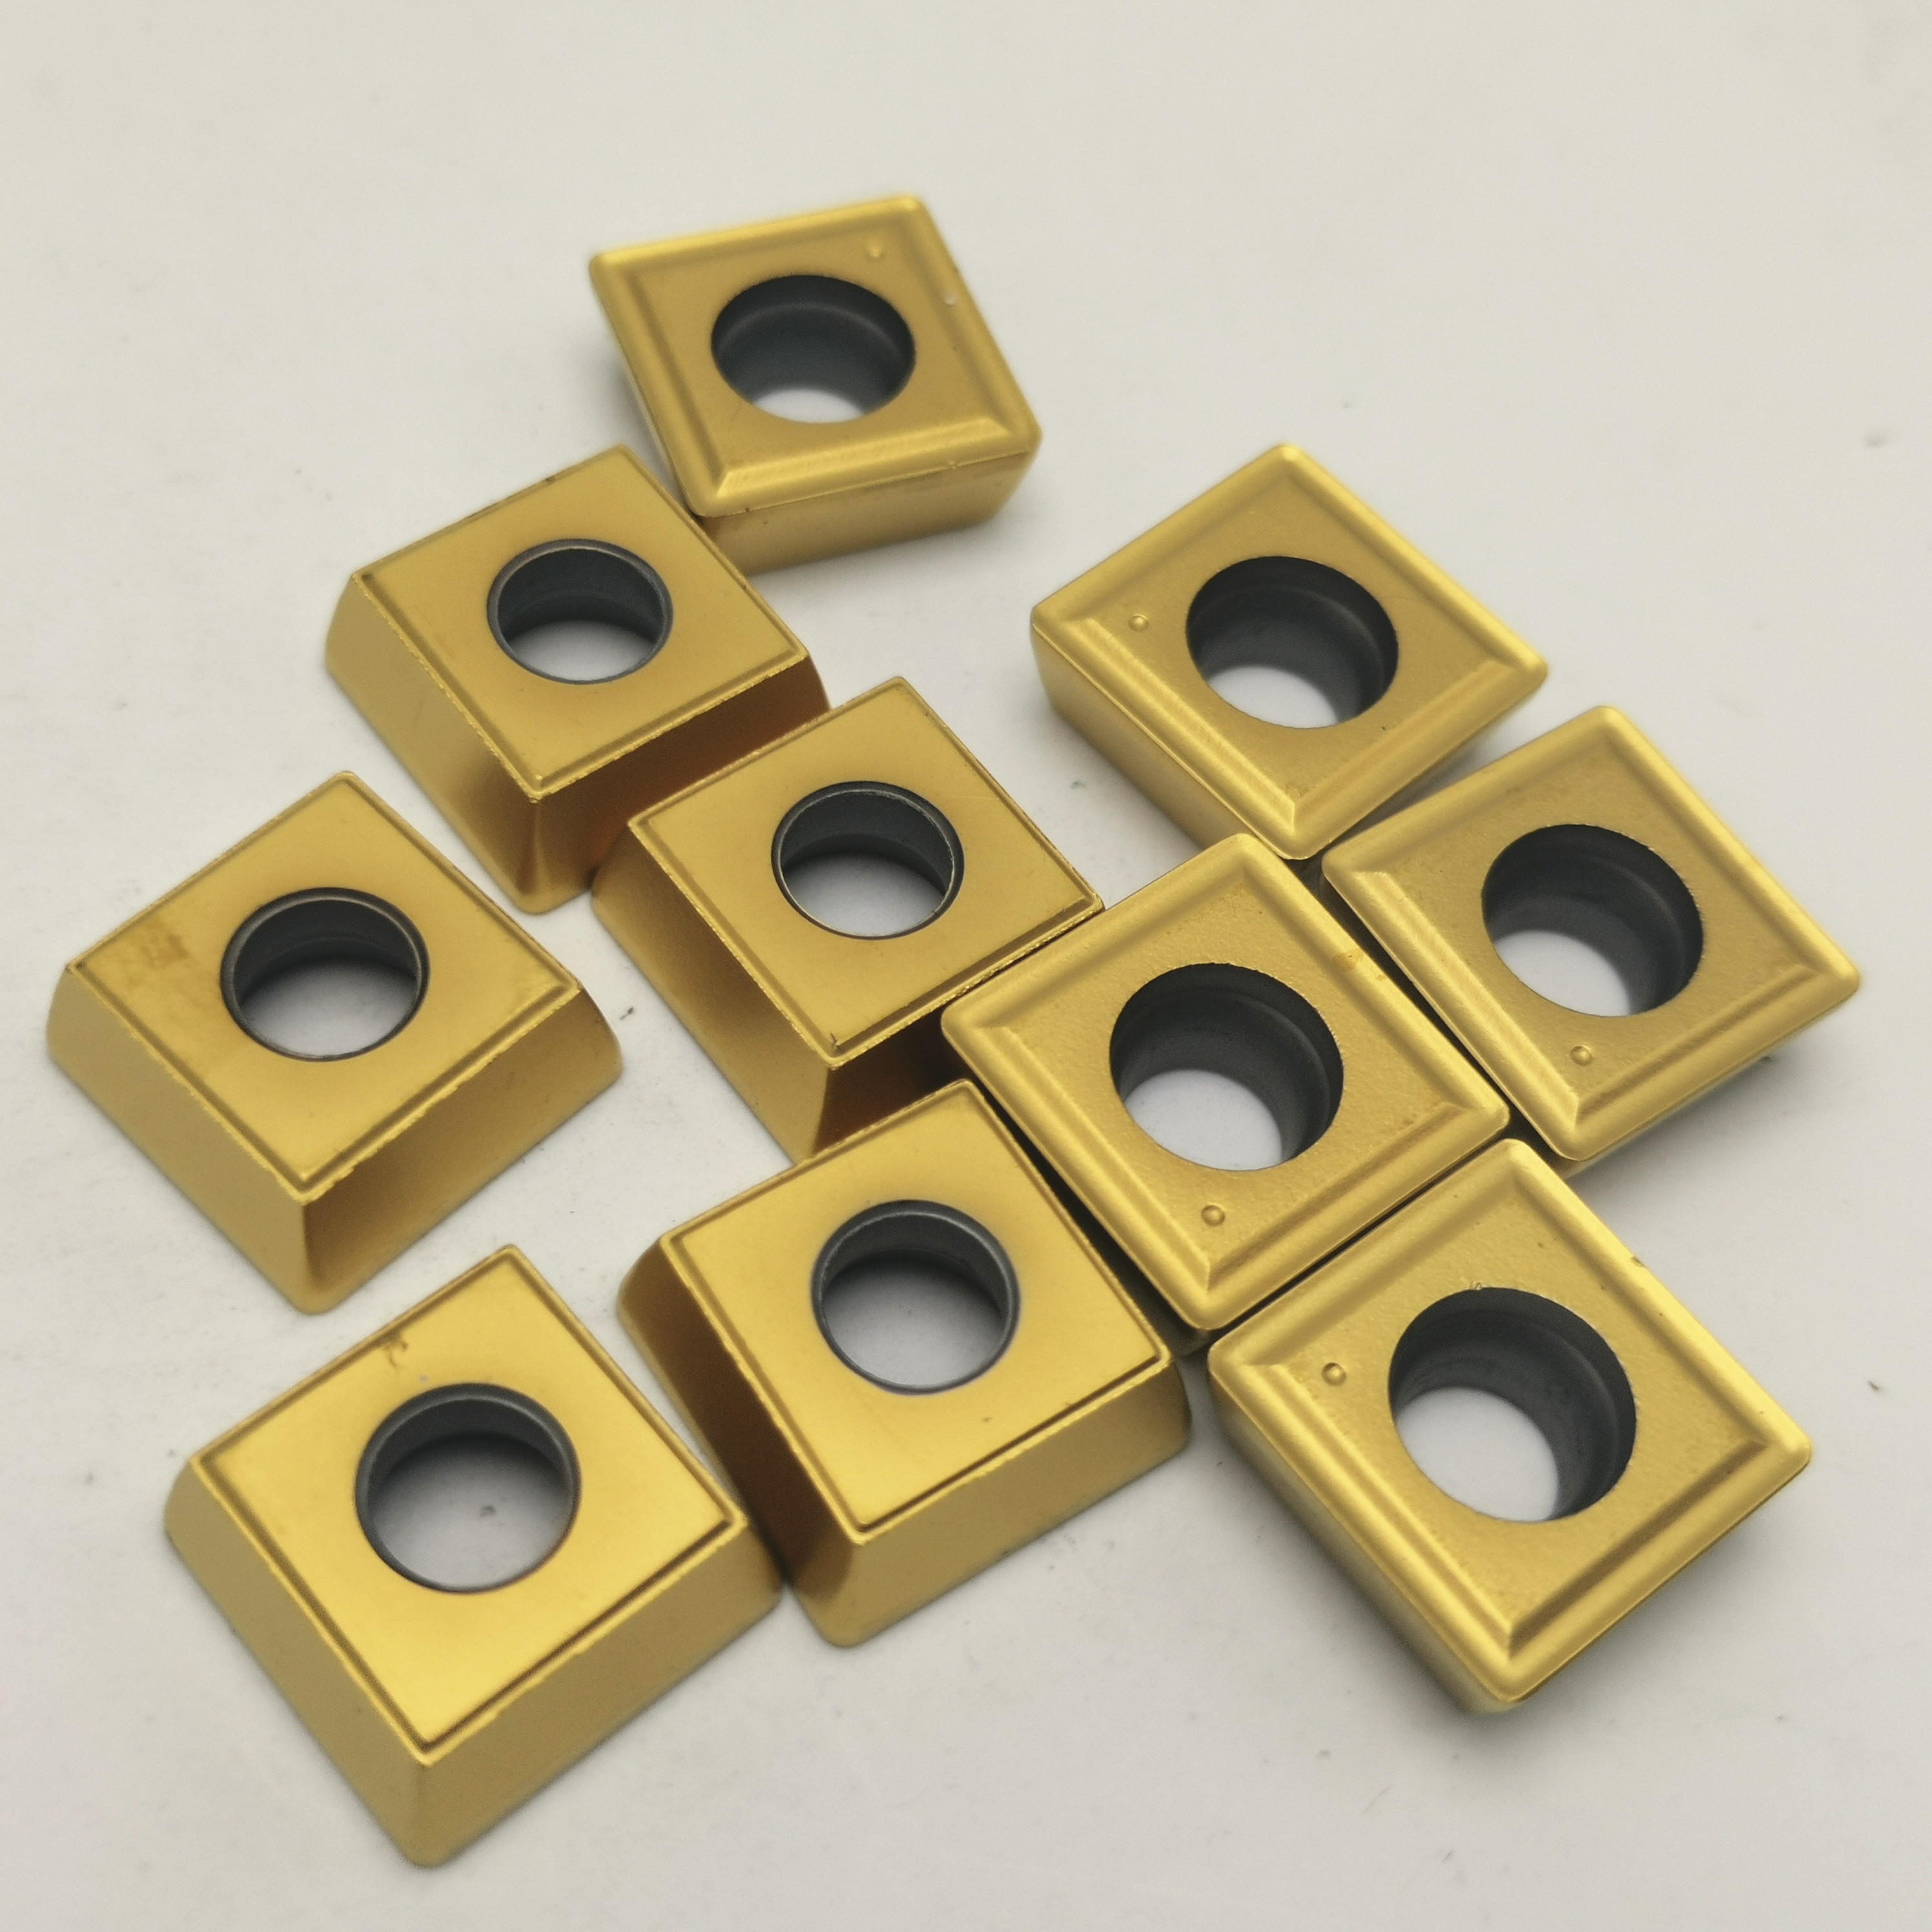 Tungsten Carbide U drills SPMG07T308 DG TT9030/TT8020 carbide inserts turning tool metal lathe insert part